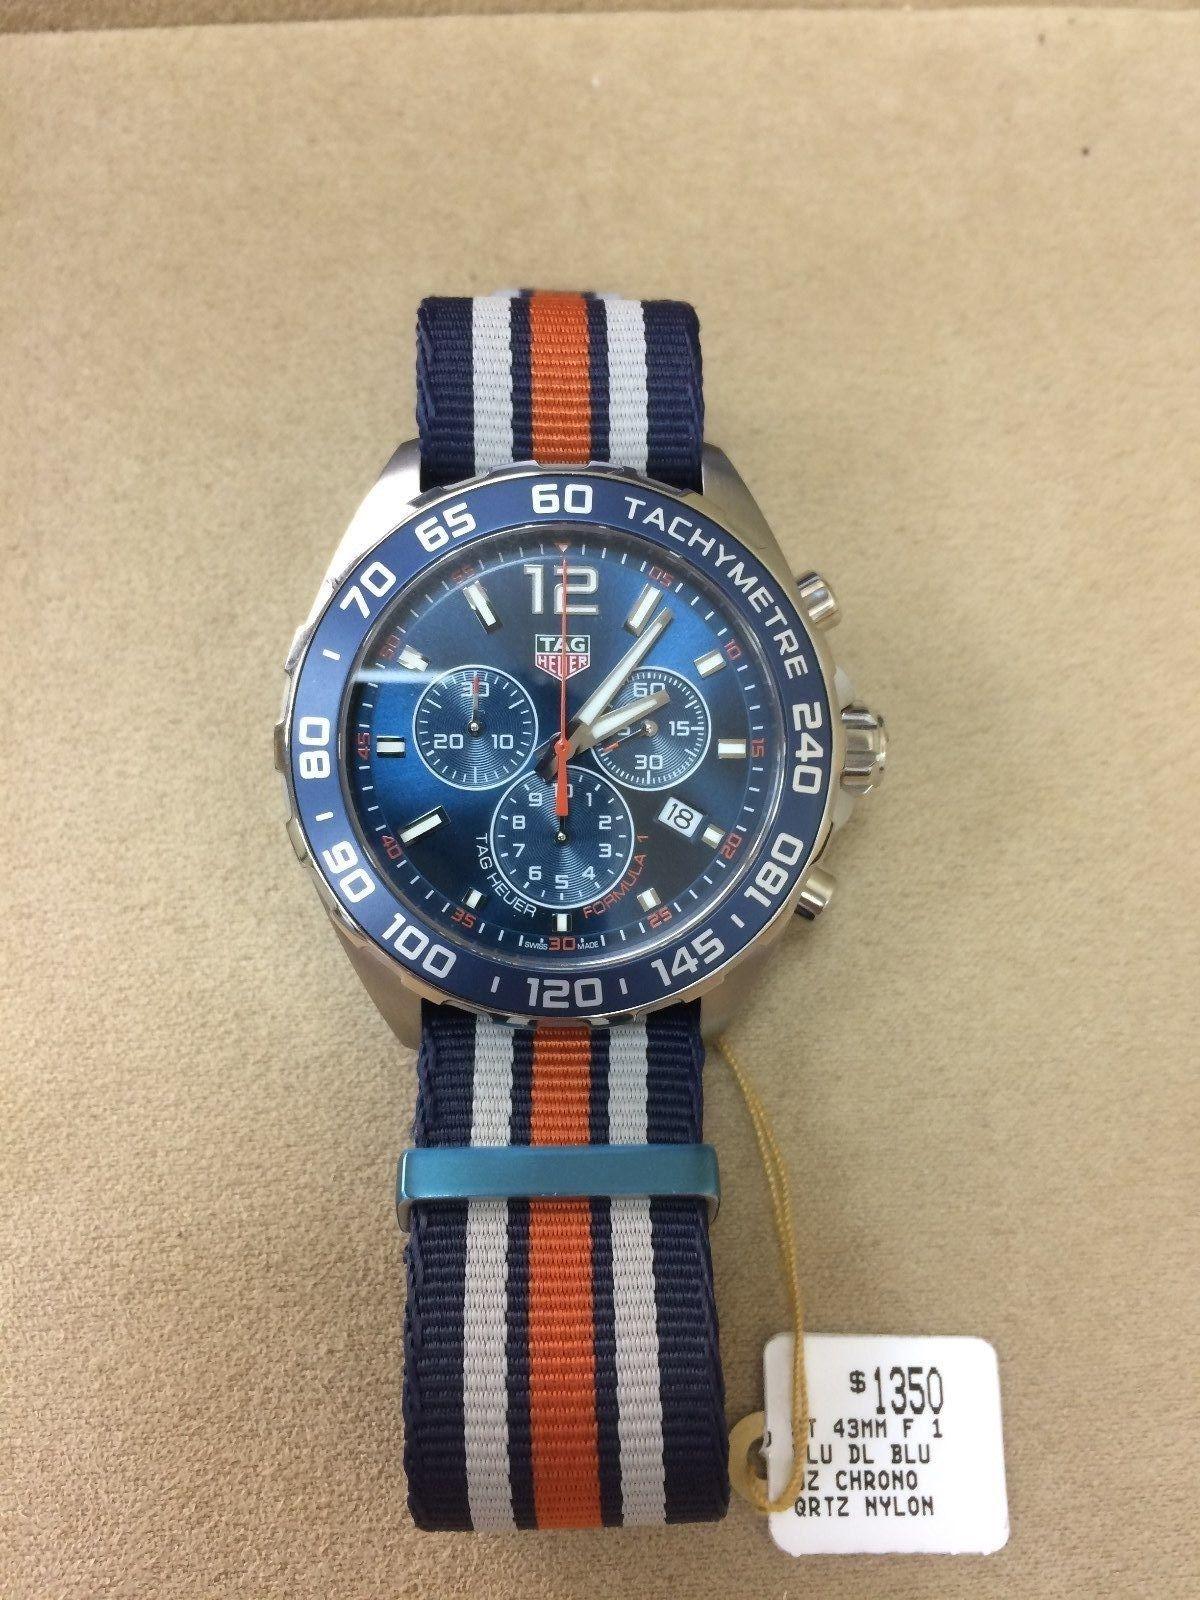 99ec13224ee4 New Tag Heuer Formula 1 Chronograph Stainless Steel Quartz Watch  caz1014.fc8196